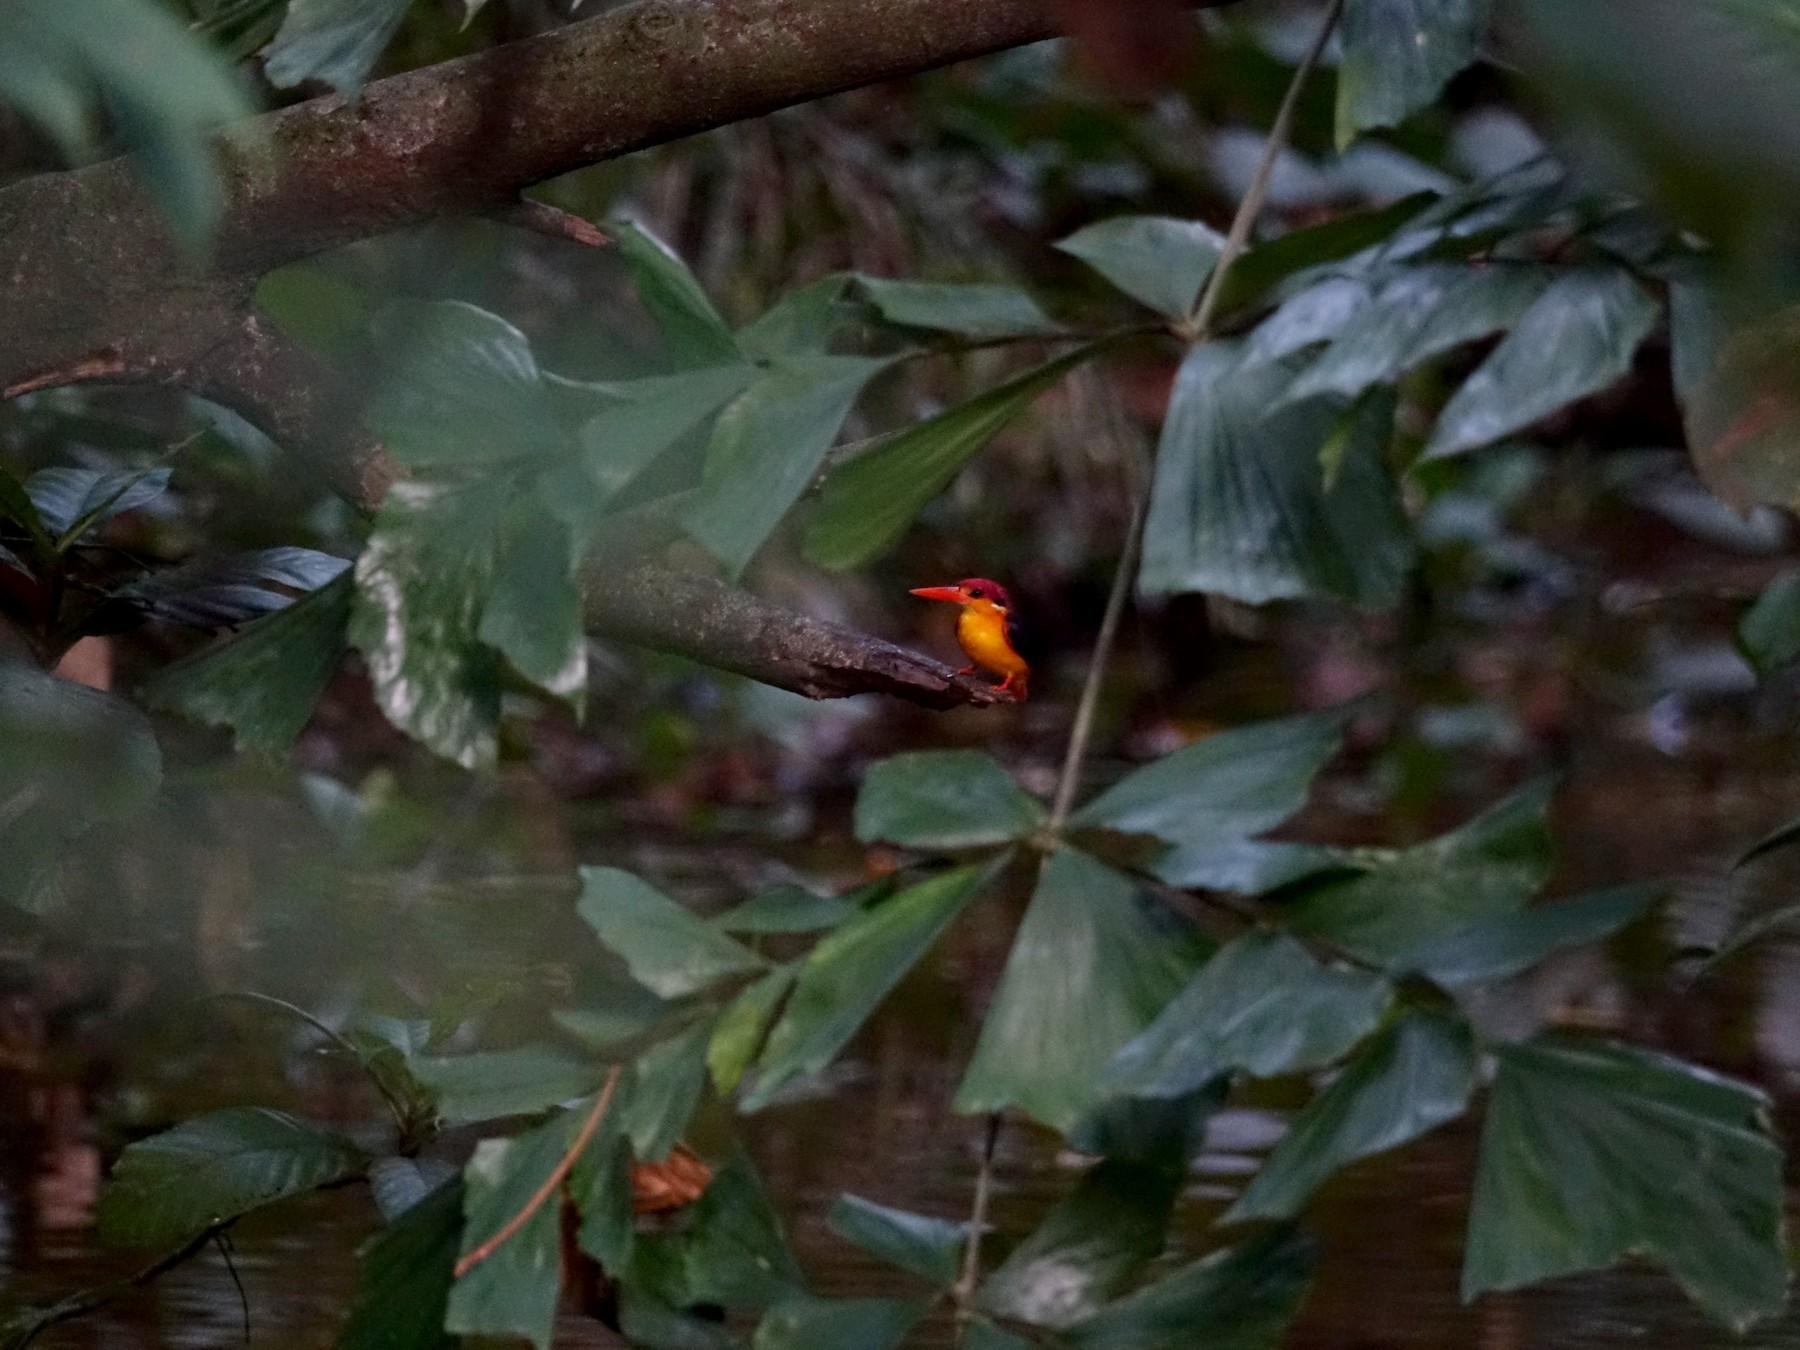 Black-backed Dwarf-Kingfisher - Raghav Narayanswamy